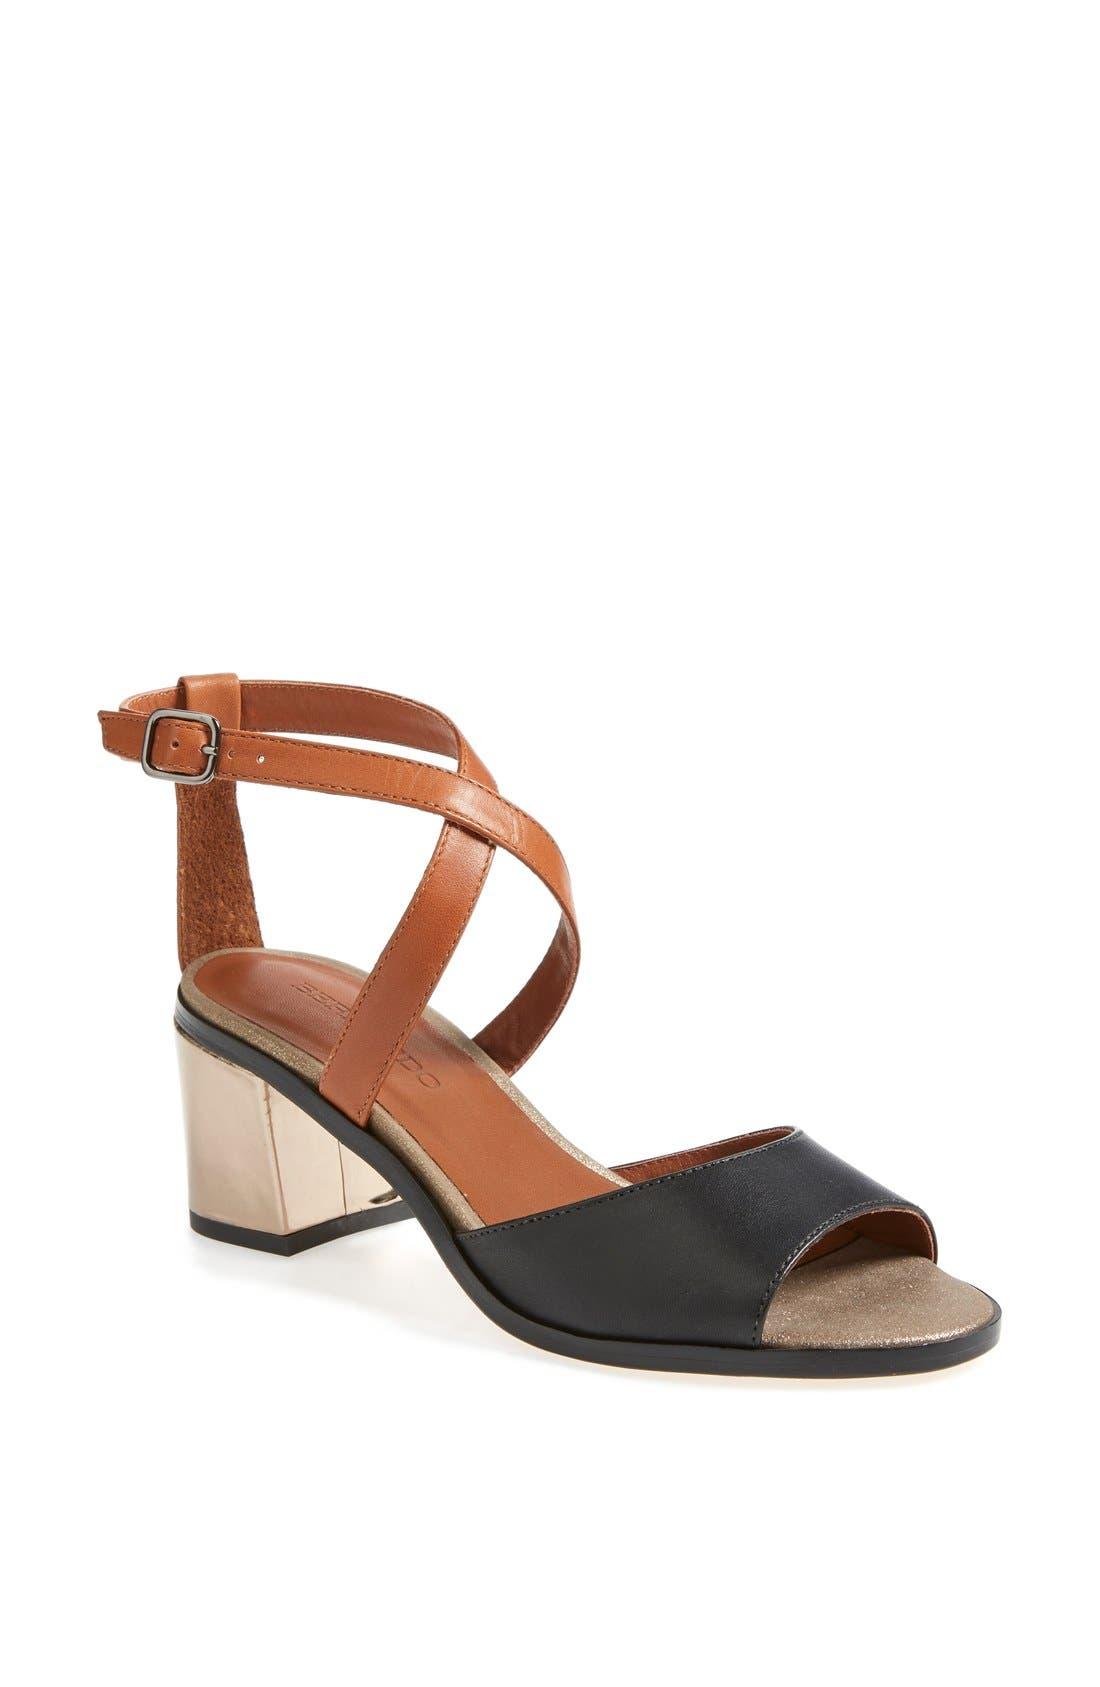 Main Image - Bernardo Footwear Sandal